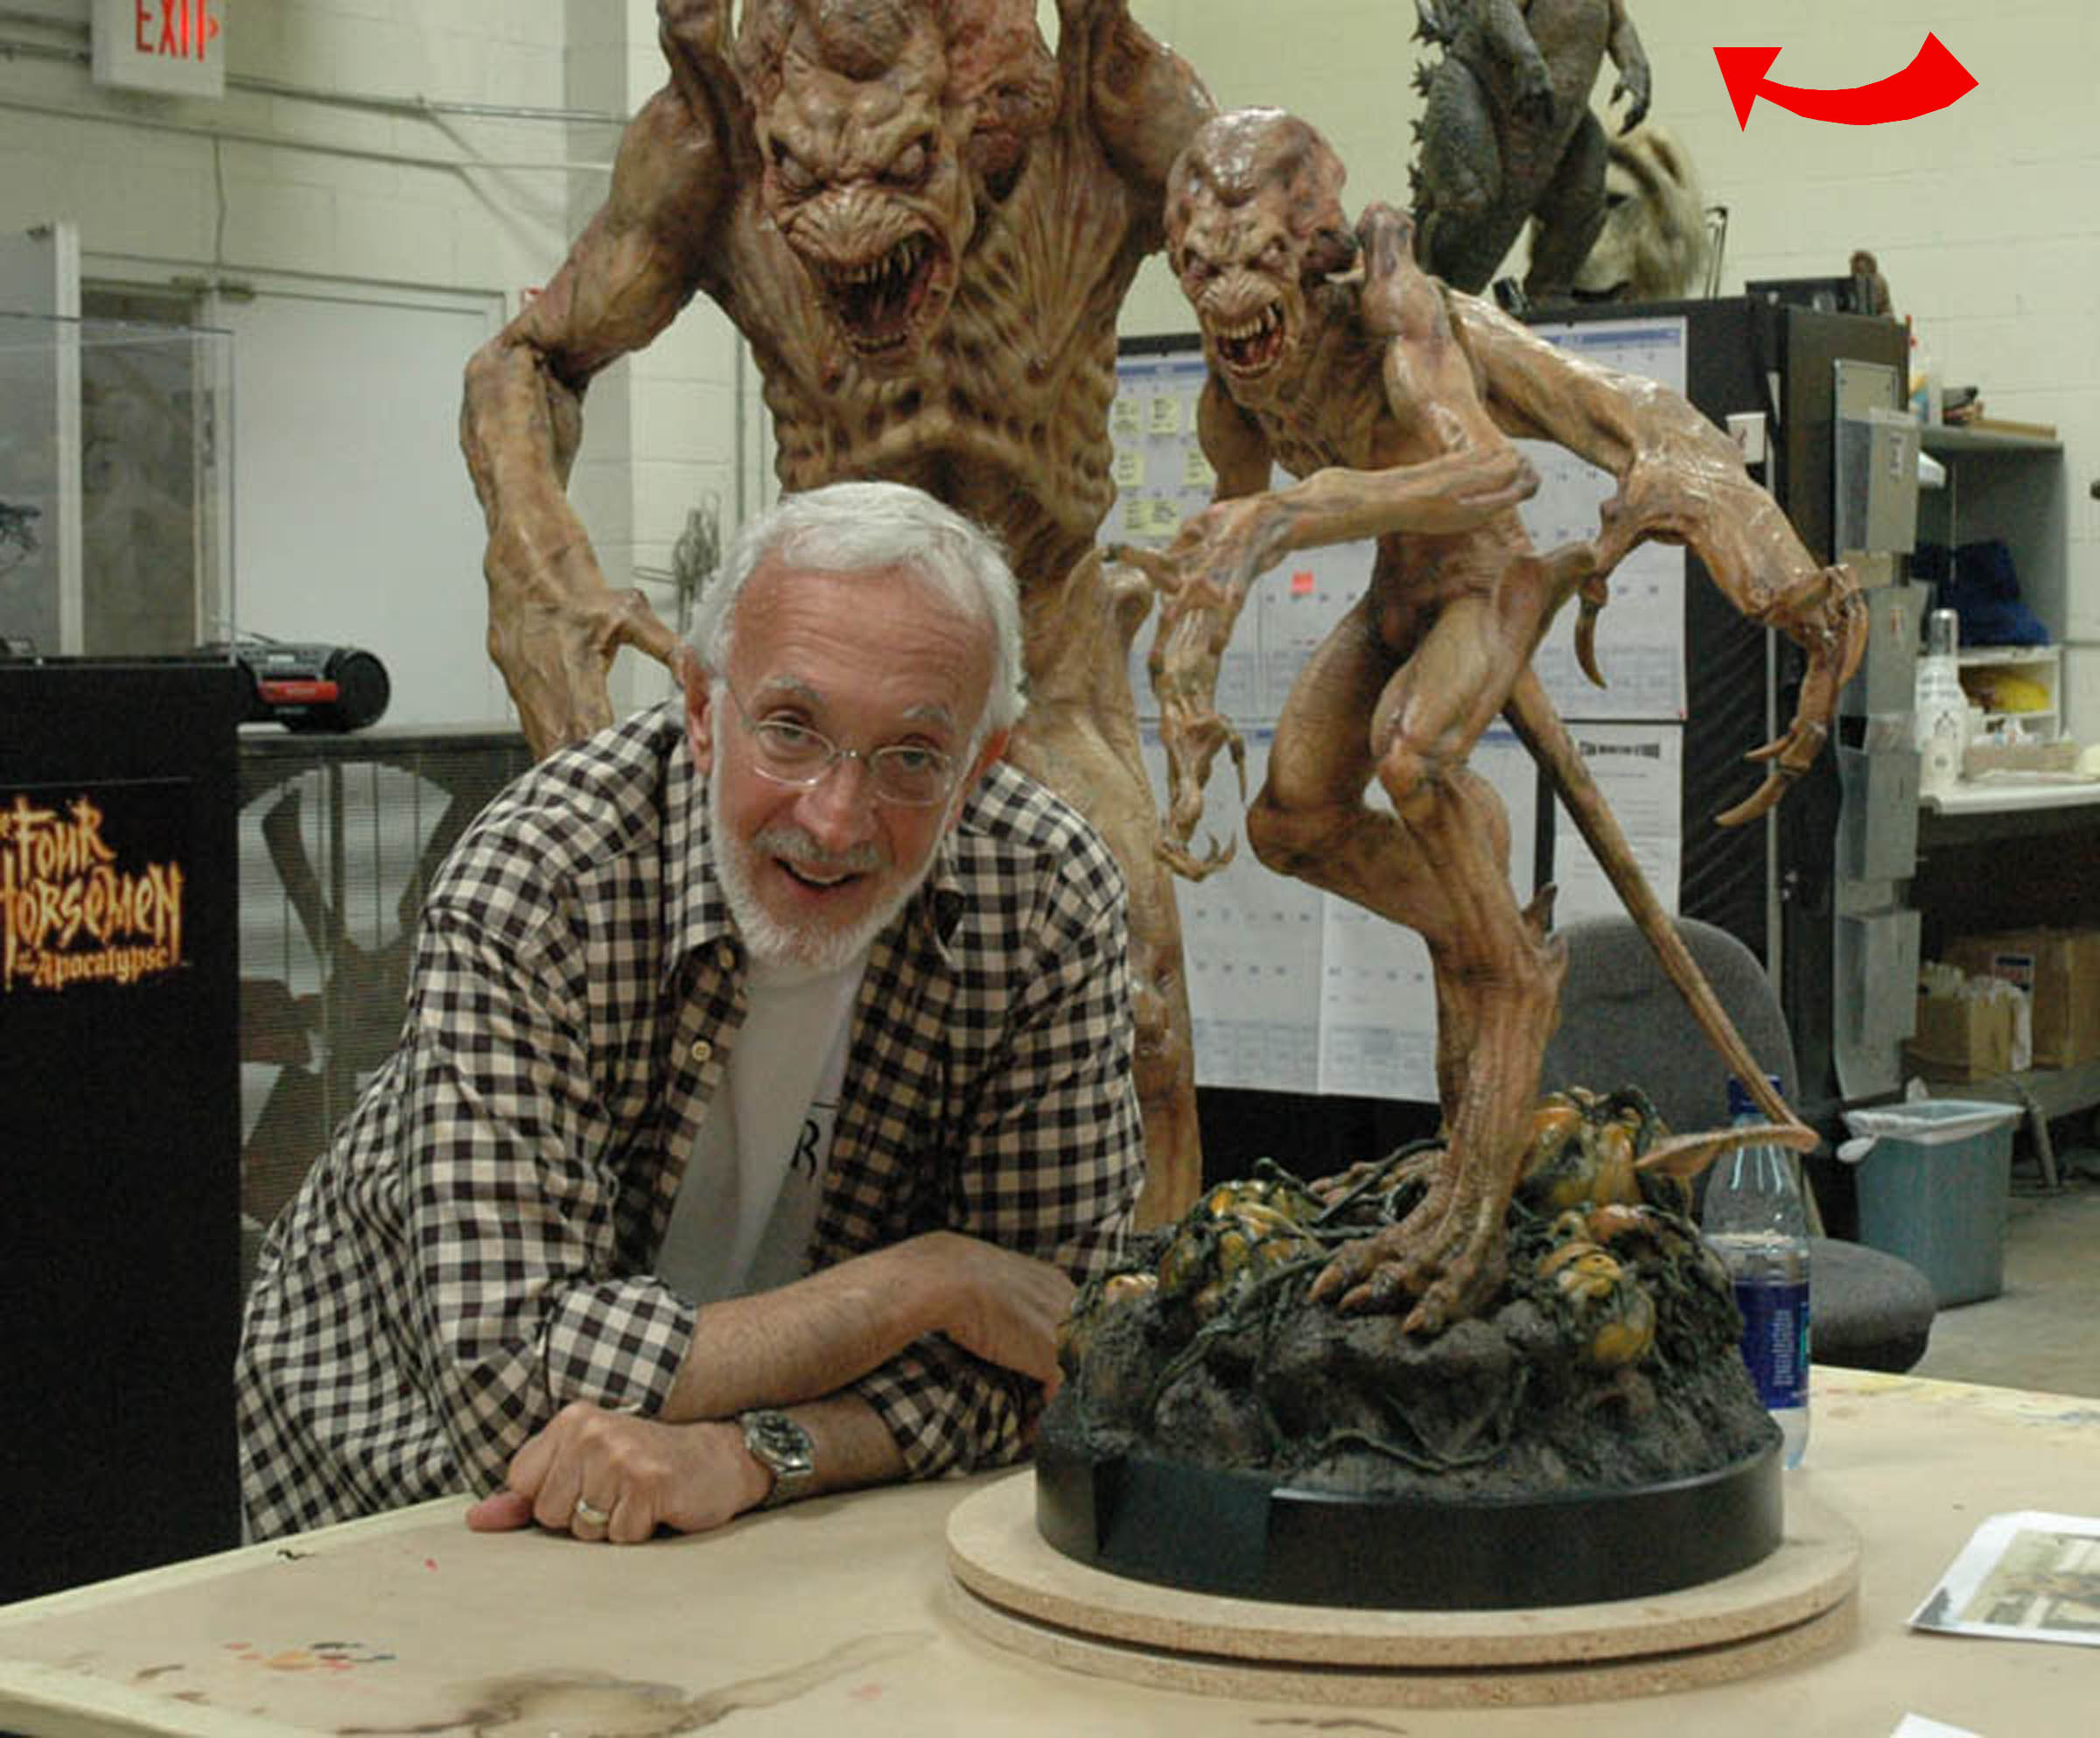 Stan Wiinston with Pumpkinhead and Godzilla